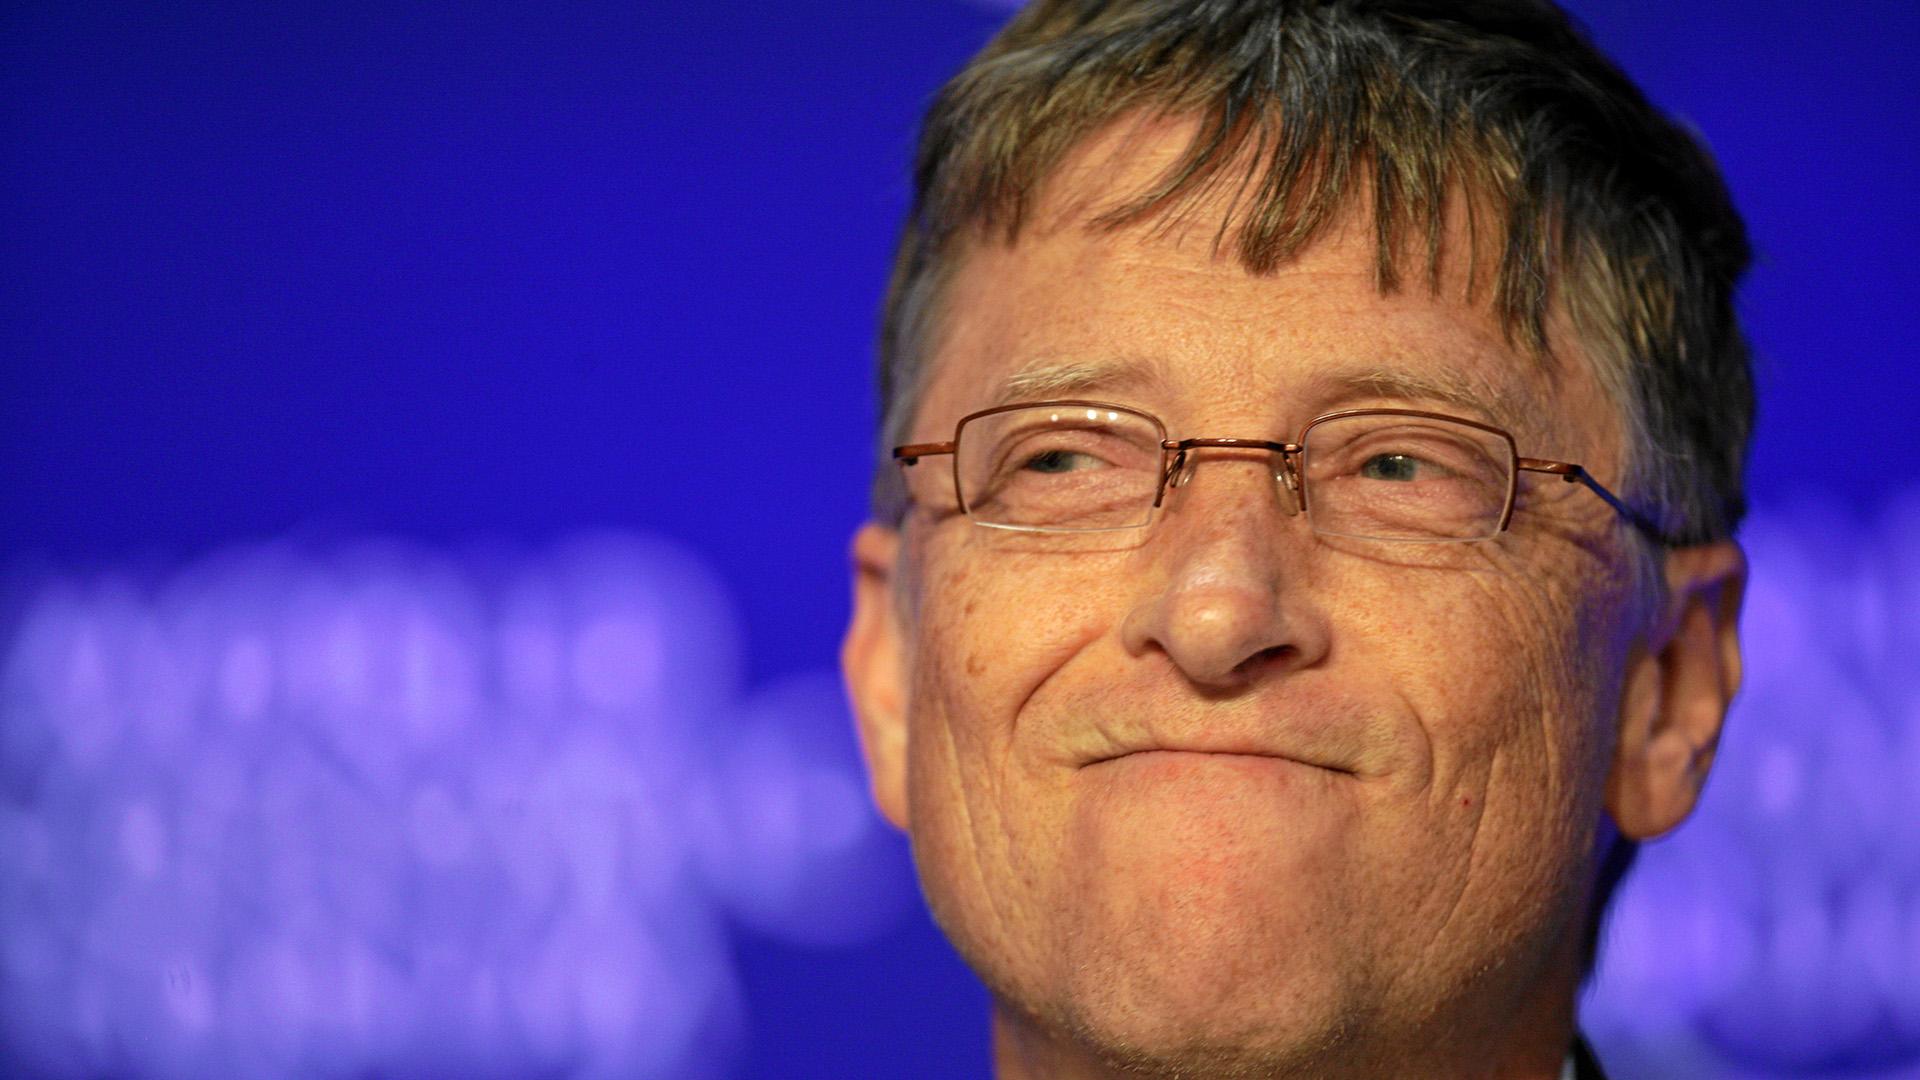 Bill Gates File Photo